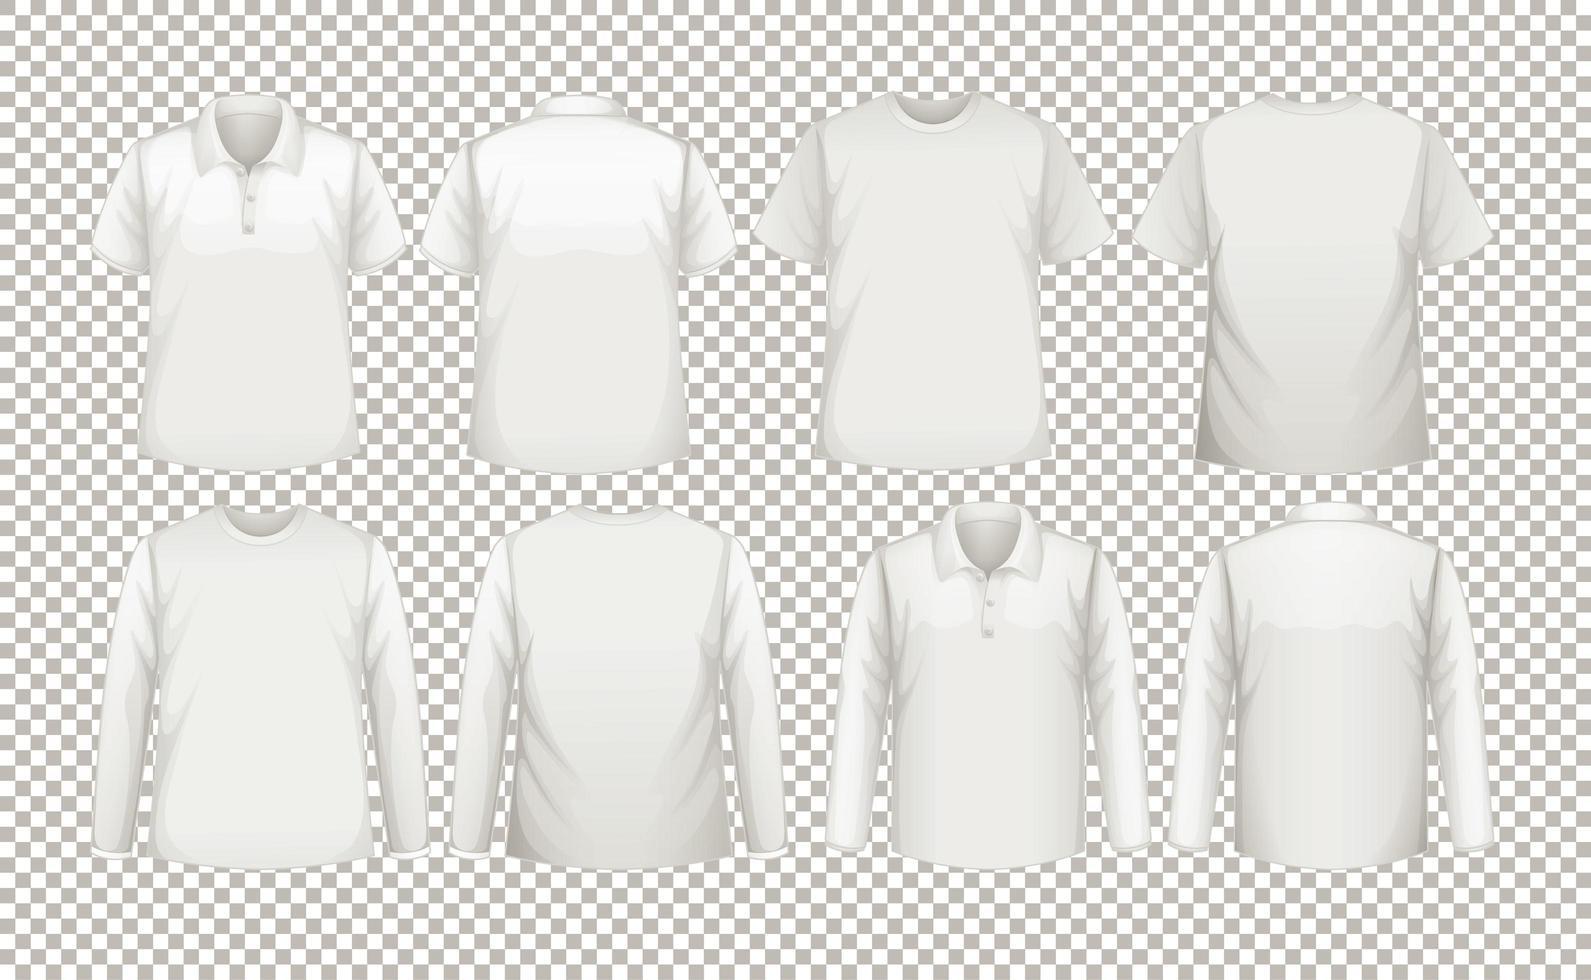 en samling av olika typer av vita skjortor vektor